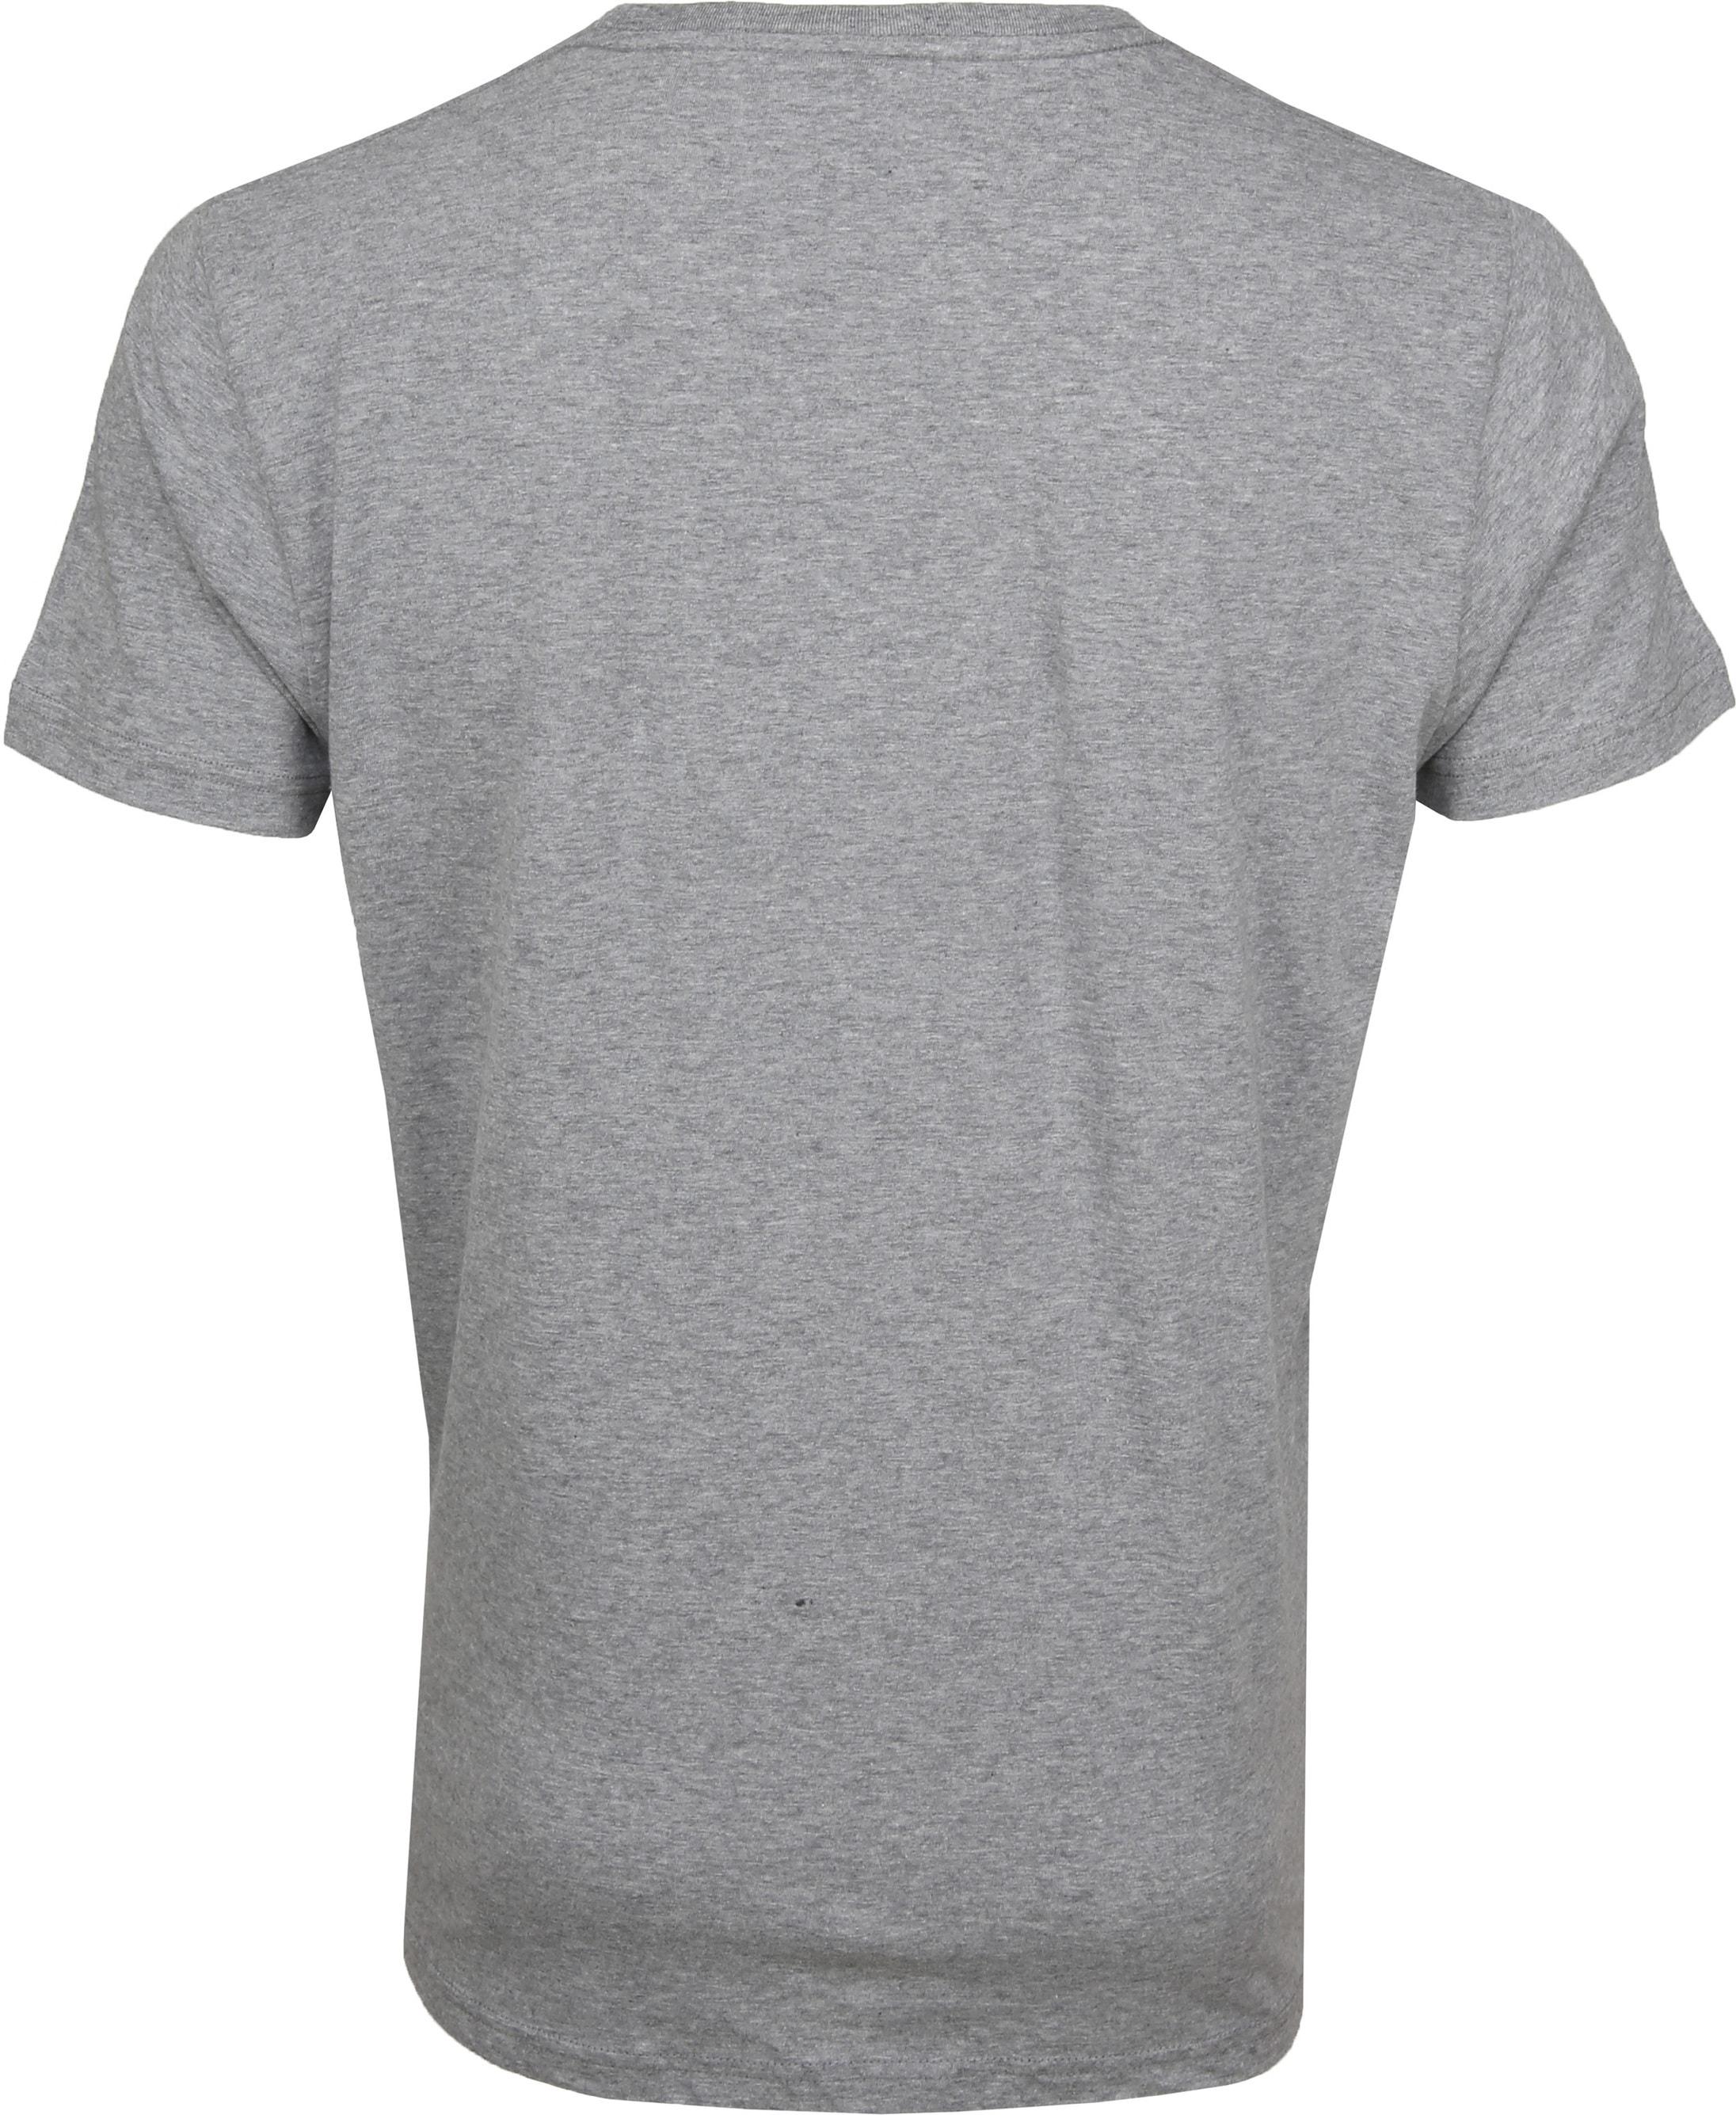 Gant T-shirt Shield Grey foto 2